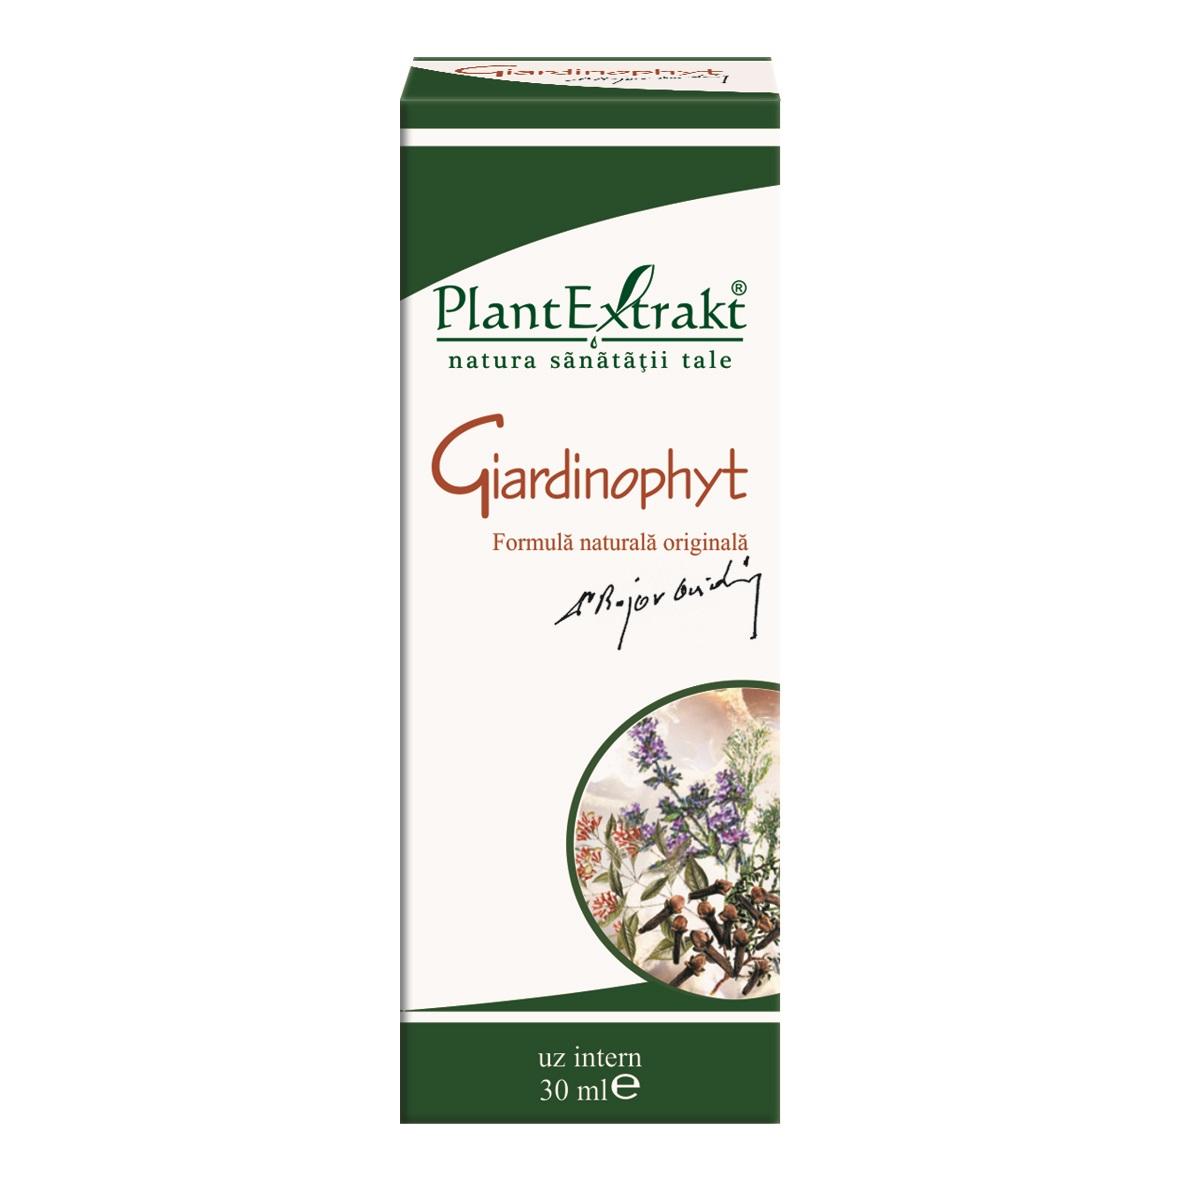 PlantExtrakt Giardinophyt Solutie